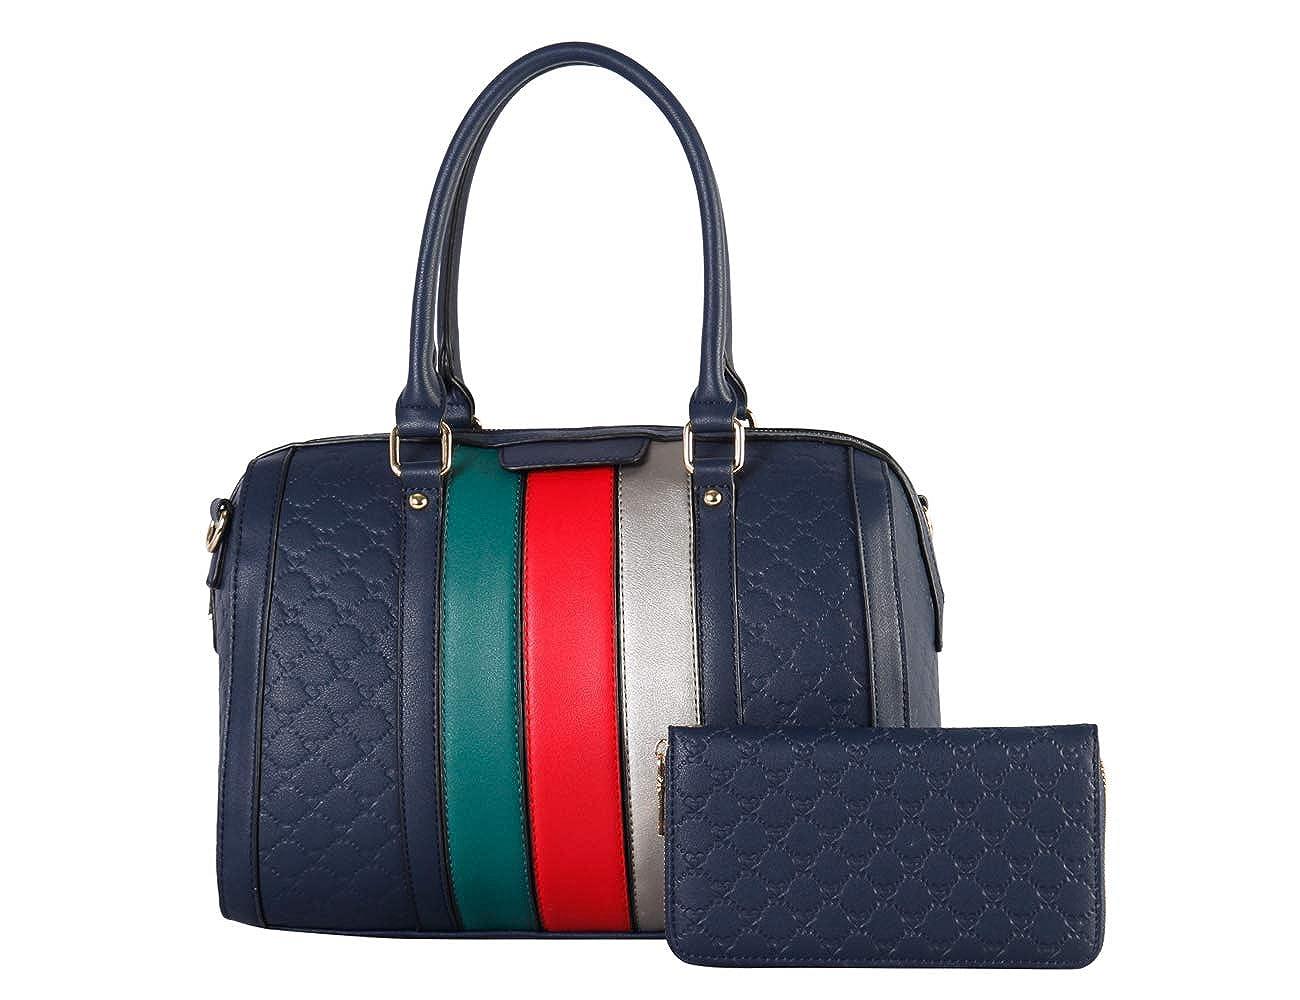 bluee Women's Fashion Handbags Shoulder Bag Designer Satchel Purse Tote Top Handle Bag 2pcs Set with coin Wallets for Ladies Gifts